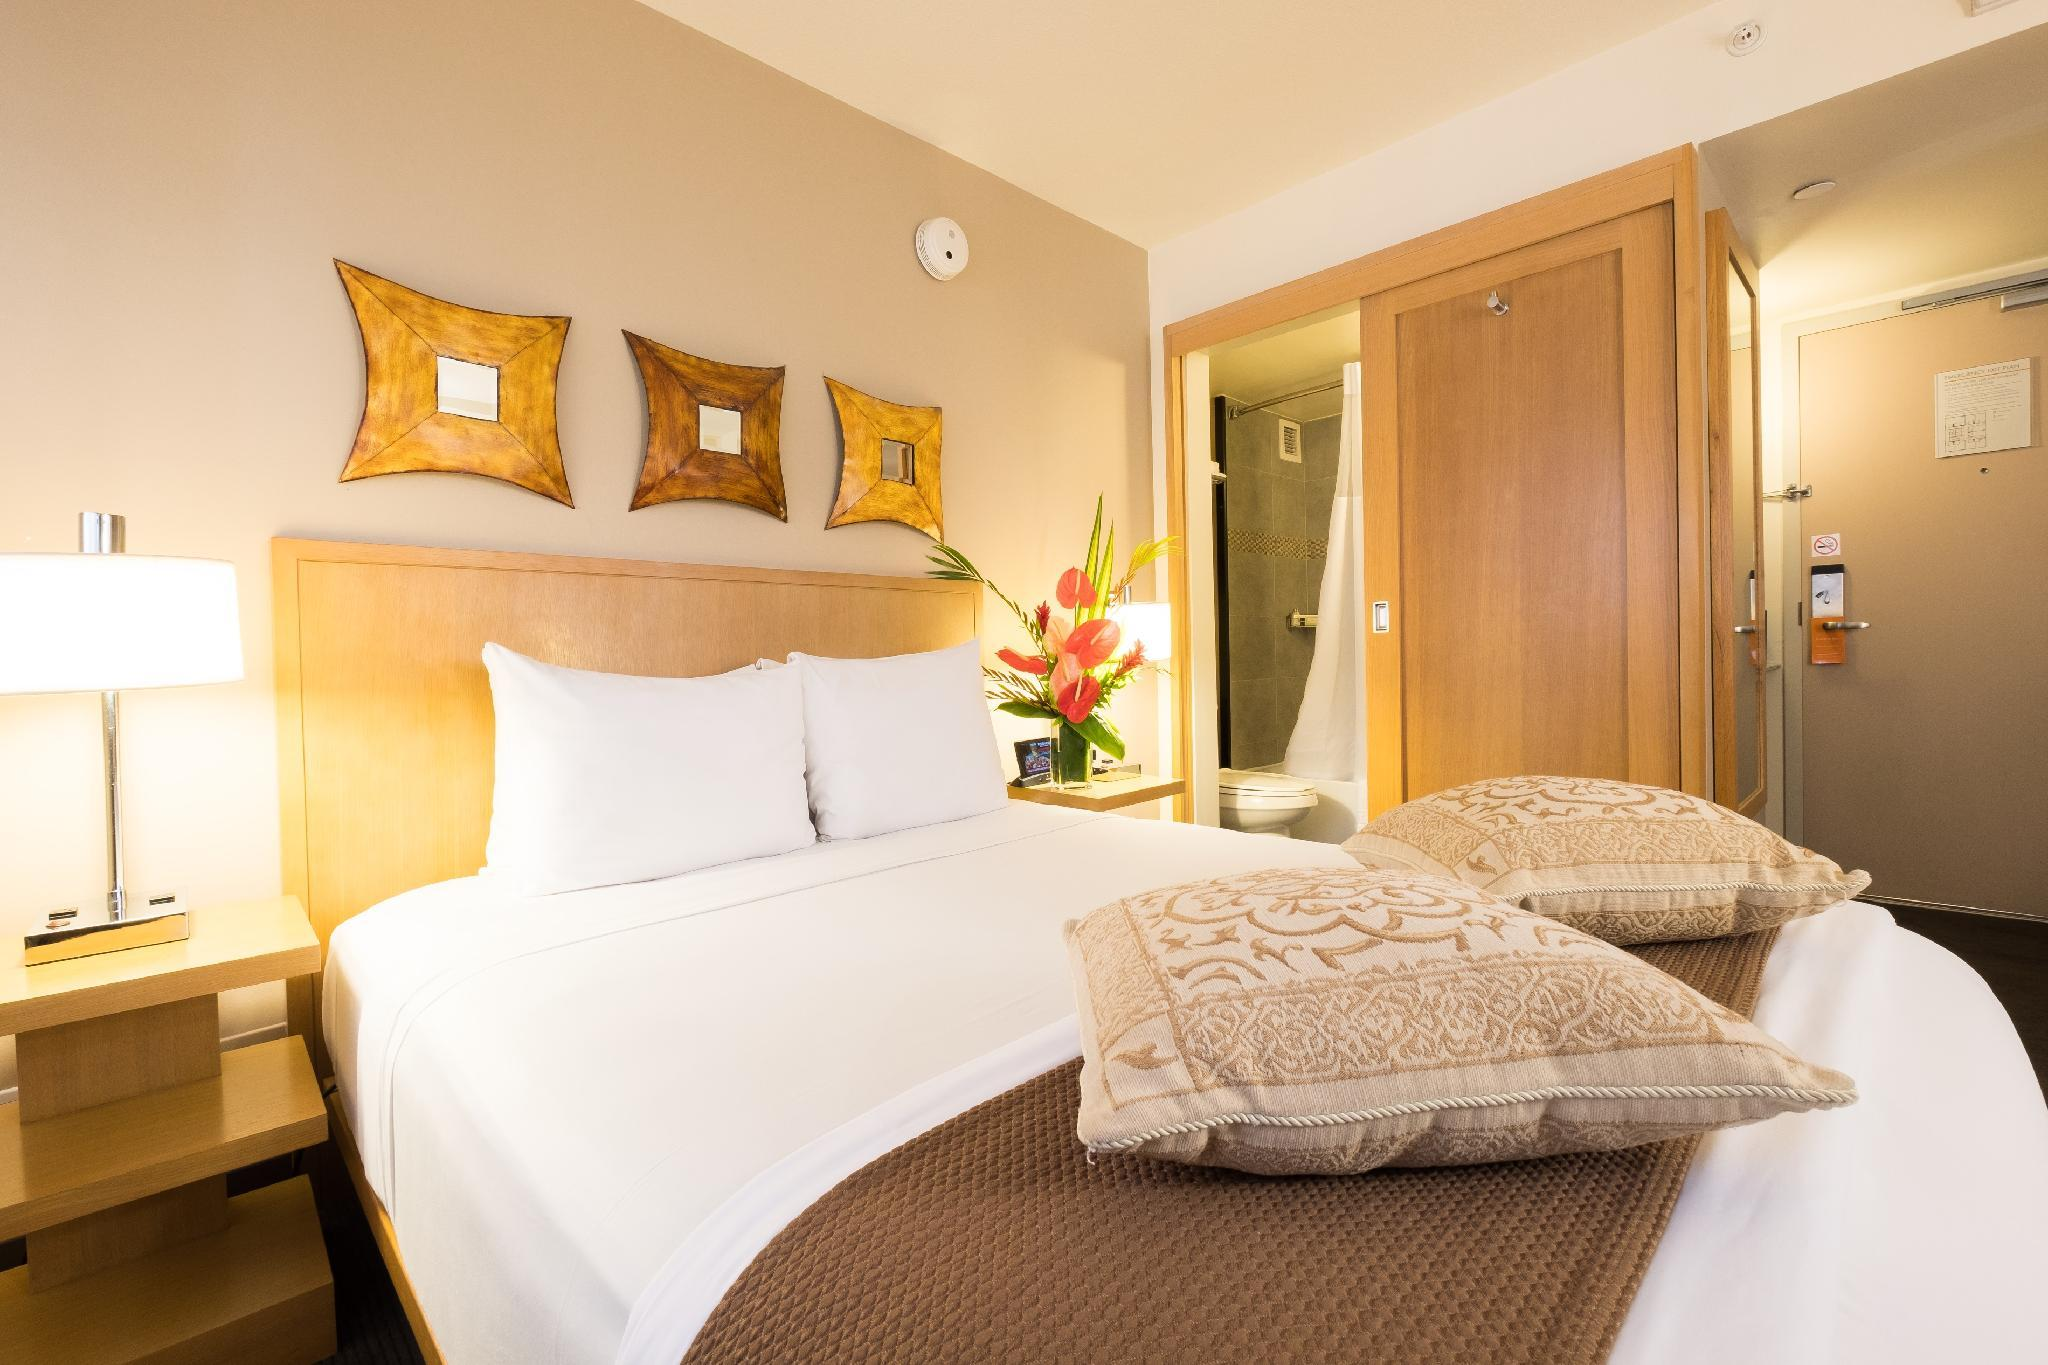 Vive Hotel Cosmopolitan Room